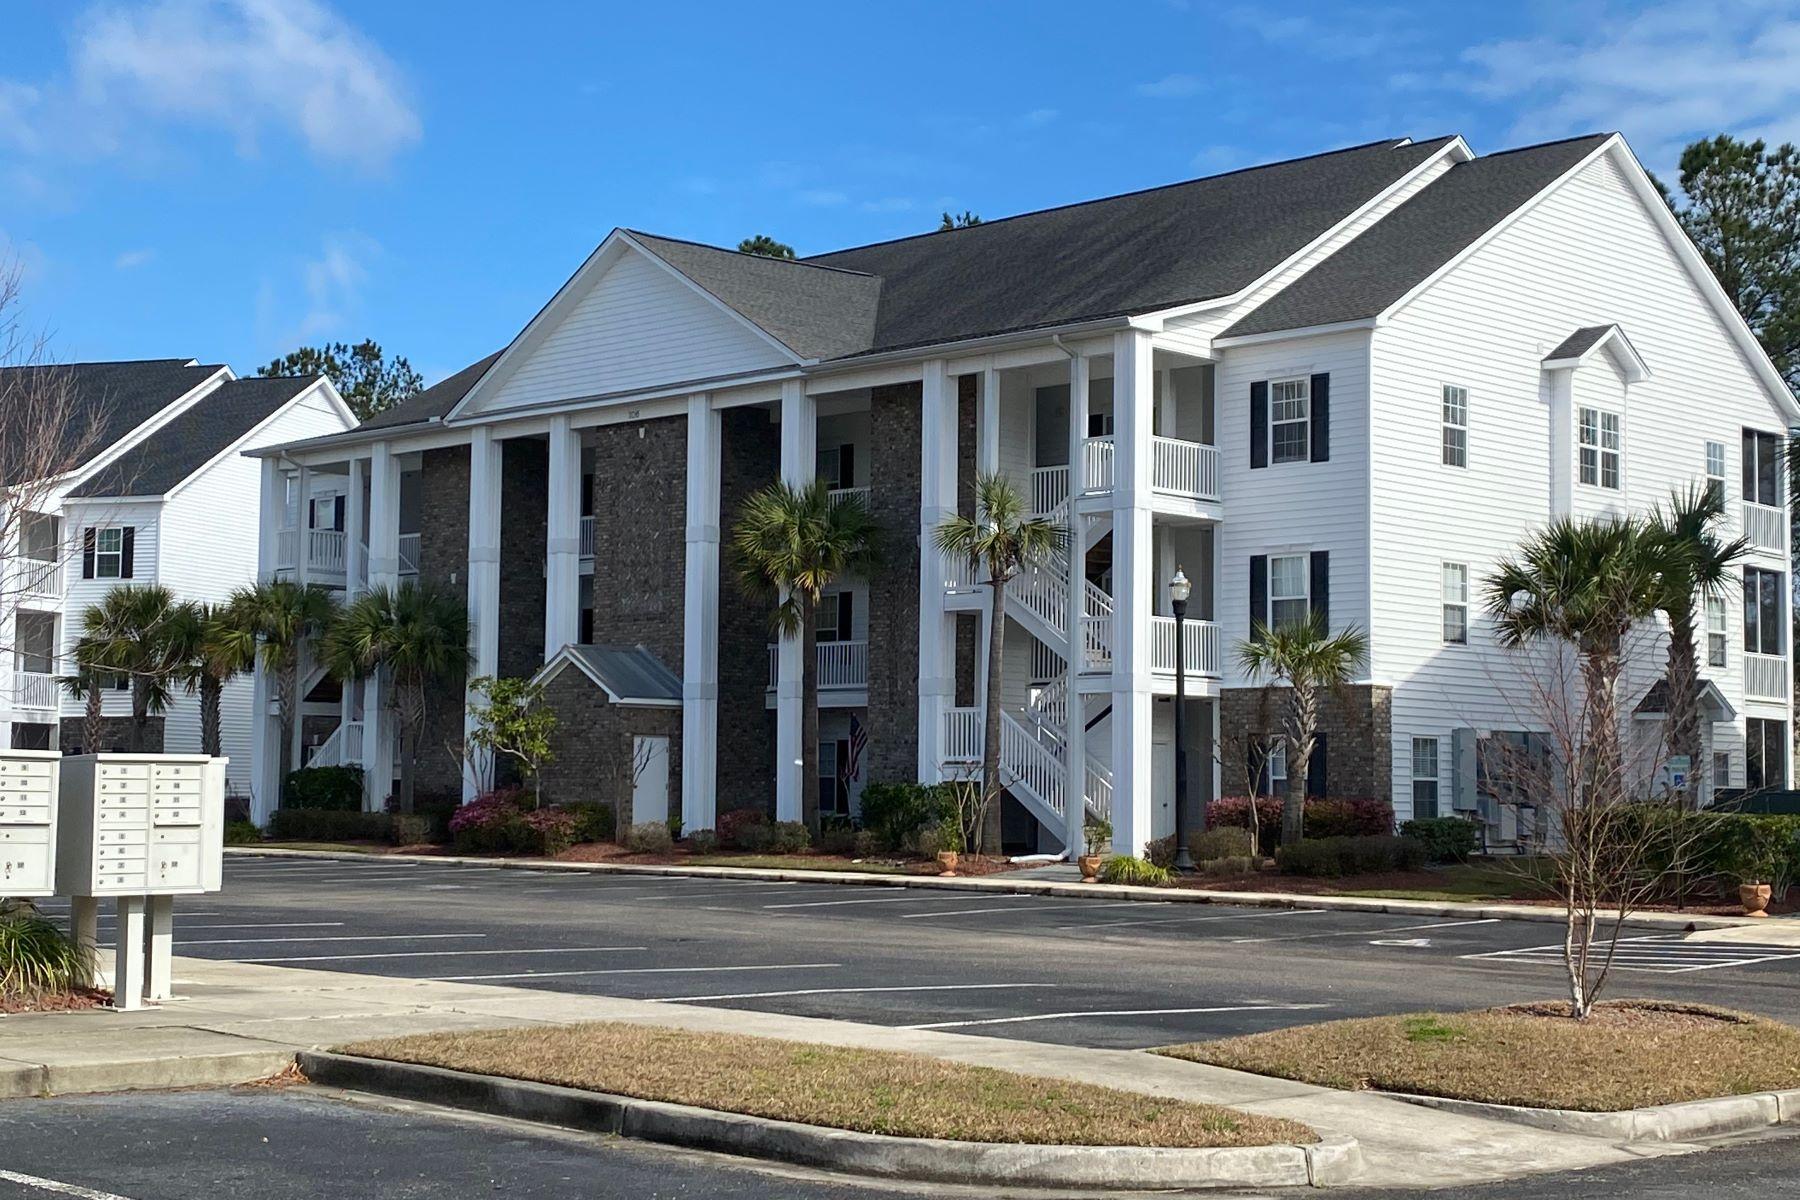 Condominiums 용 매매 에 106 Birch N Coppice Dr., Surfside Beach, Sc, 29575 106 Birch N Coppice Dr. Unit# 8, Surfside Beach, 사우스캐놀라이나 29575 미국